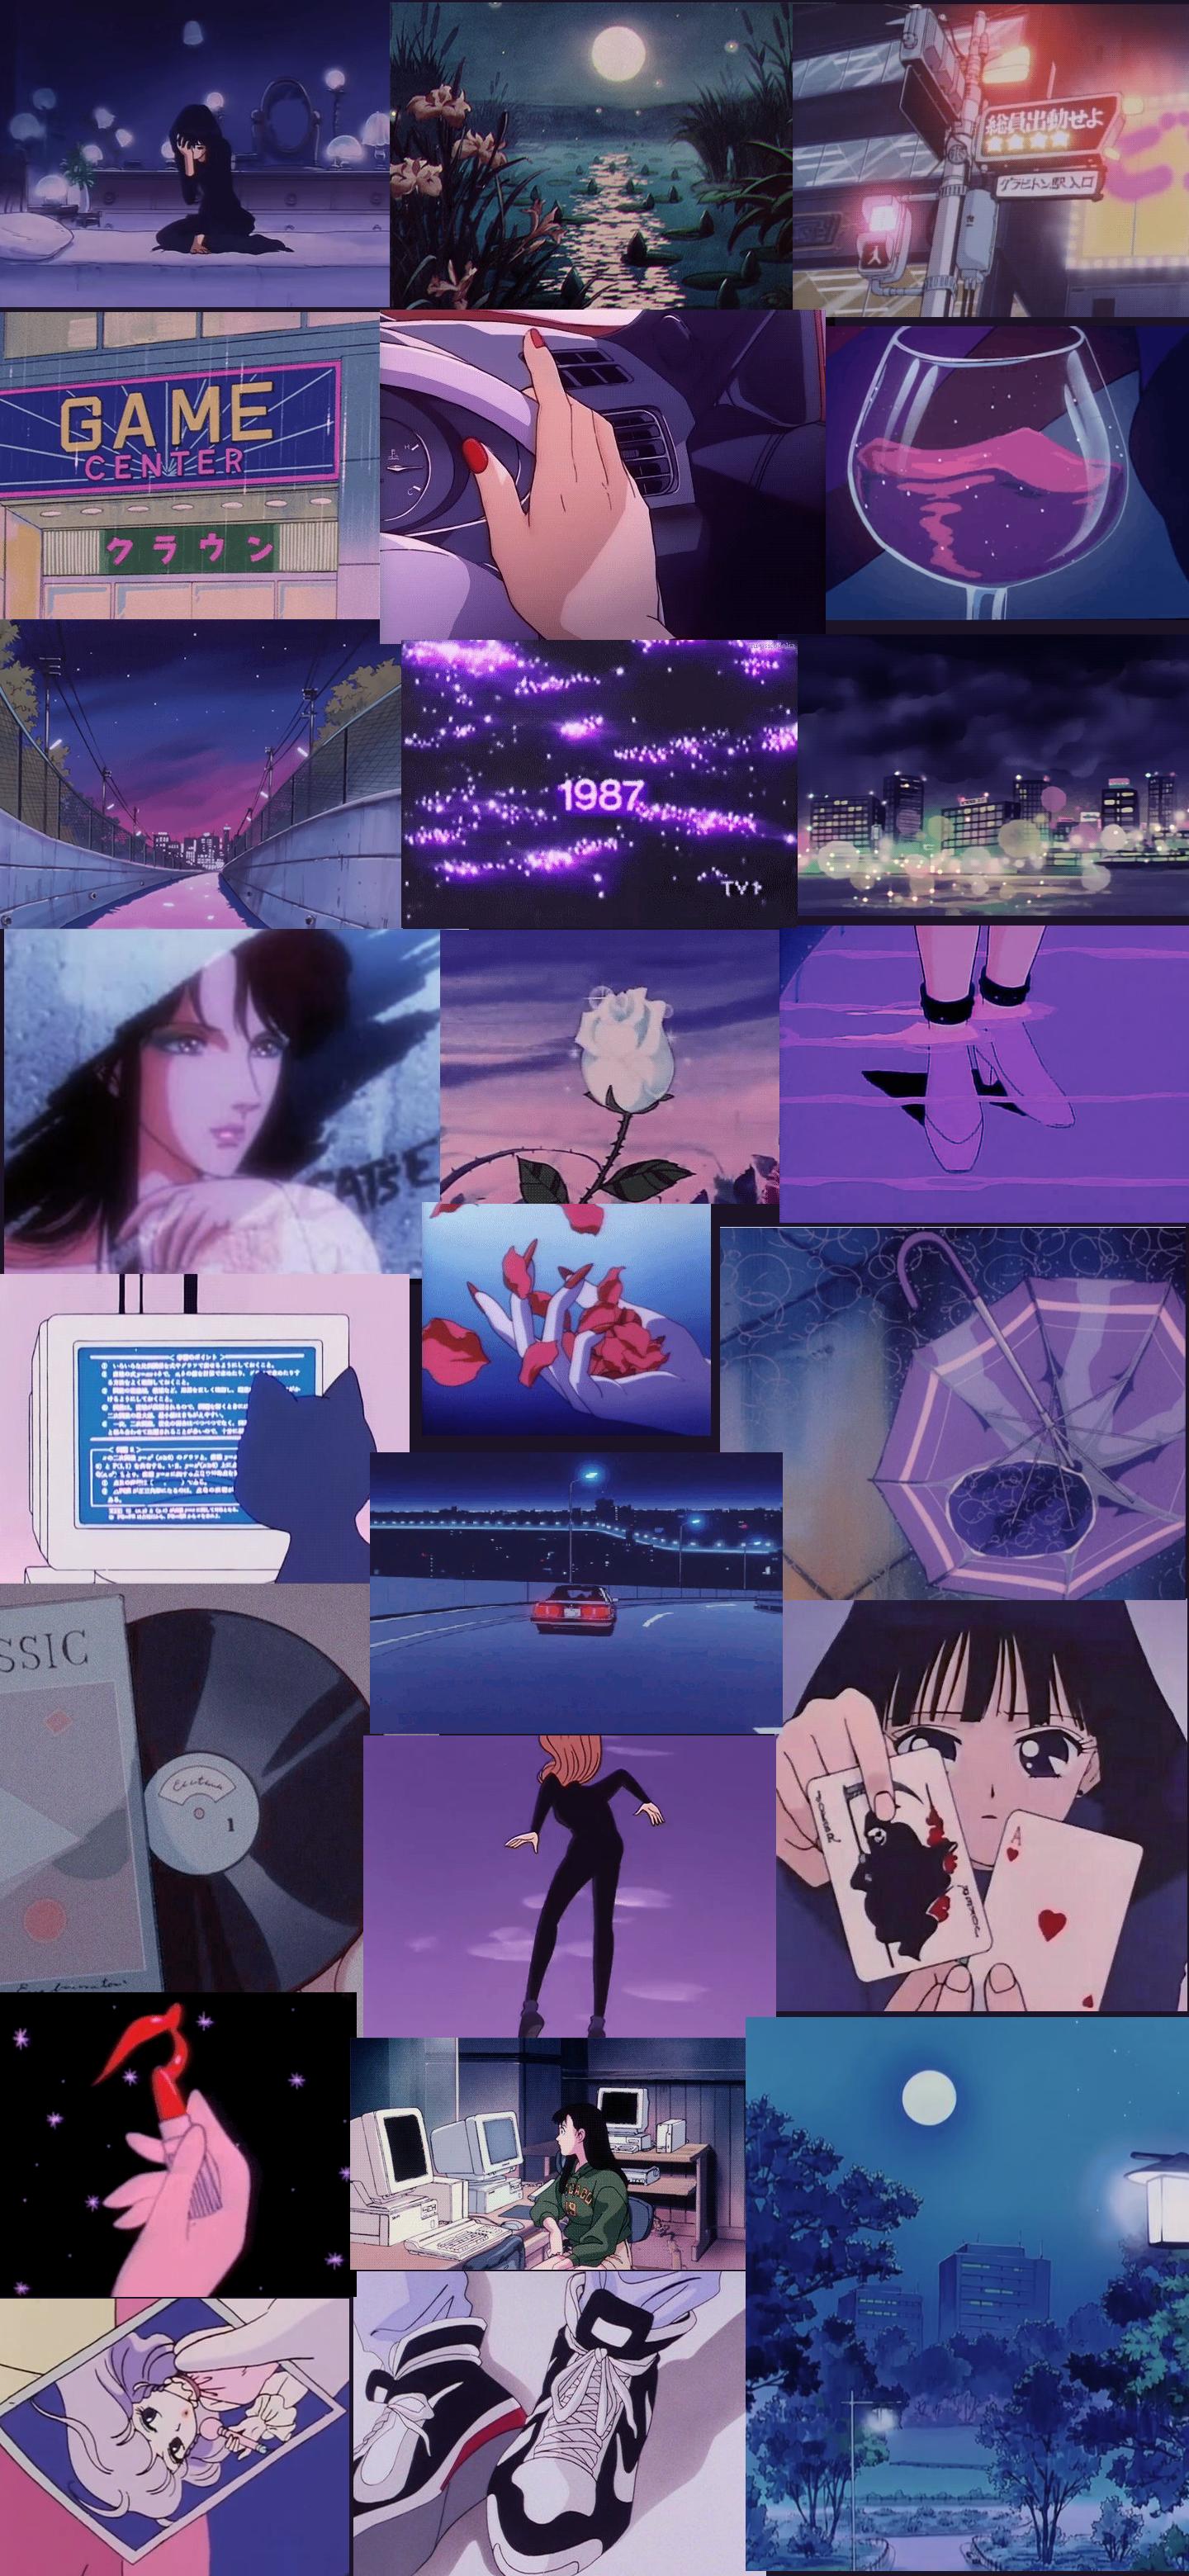 Sailor moon, cat's eye, saturn, luna, neon, tokyo, attack